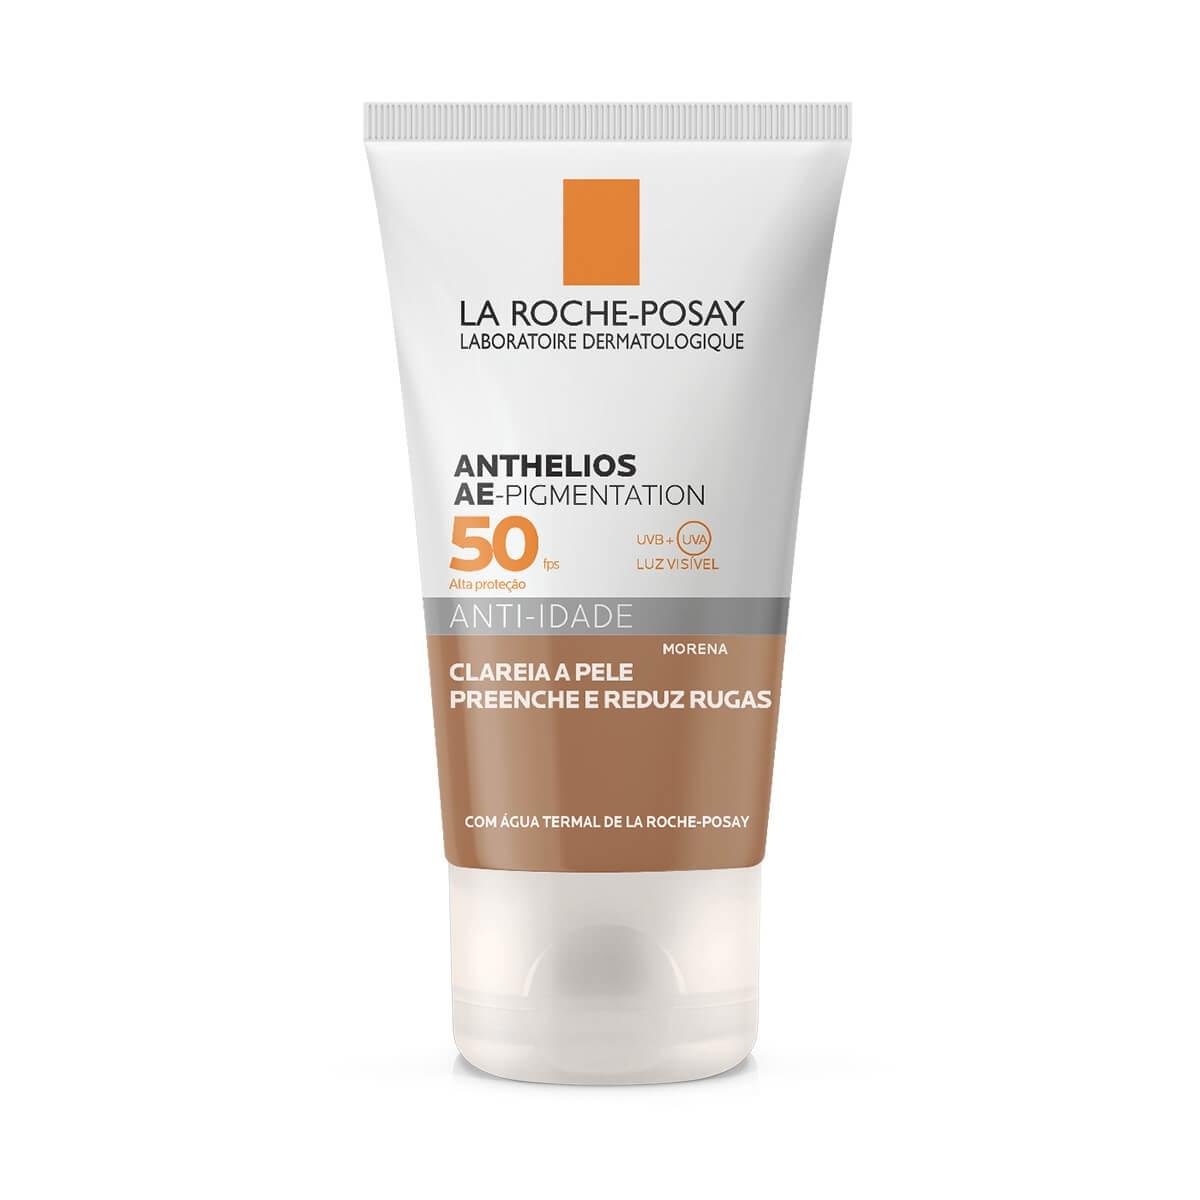 Protetor Solar Facial La Roche-Posay Anthelios AE-Pigmentation Anti-Idade Morena FPS 50 com 40g 40g